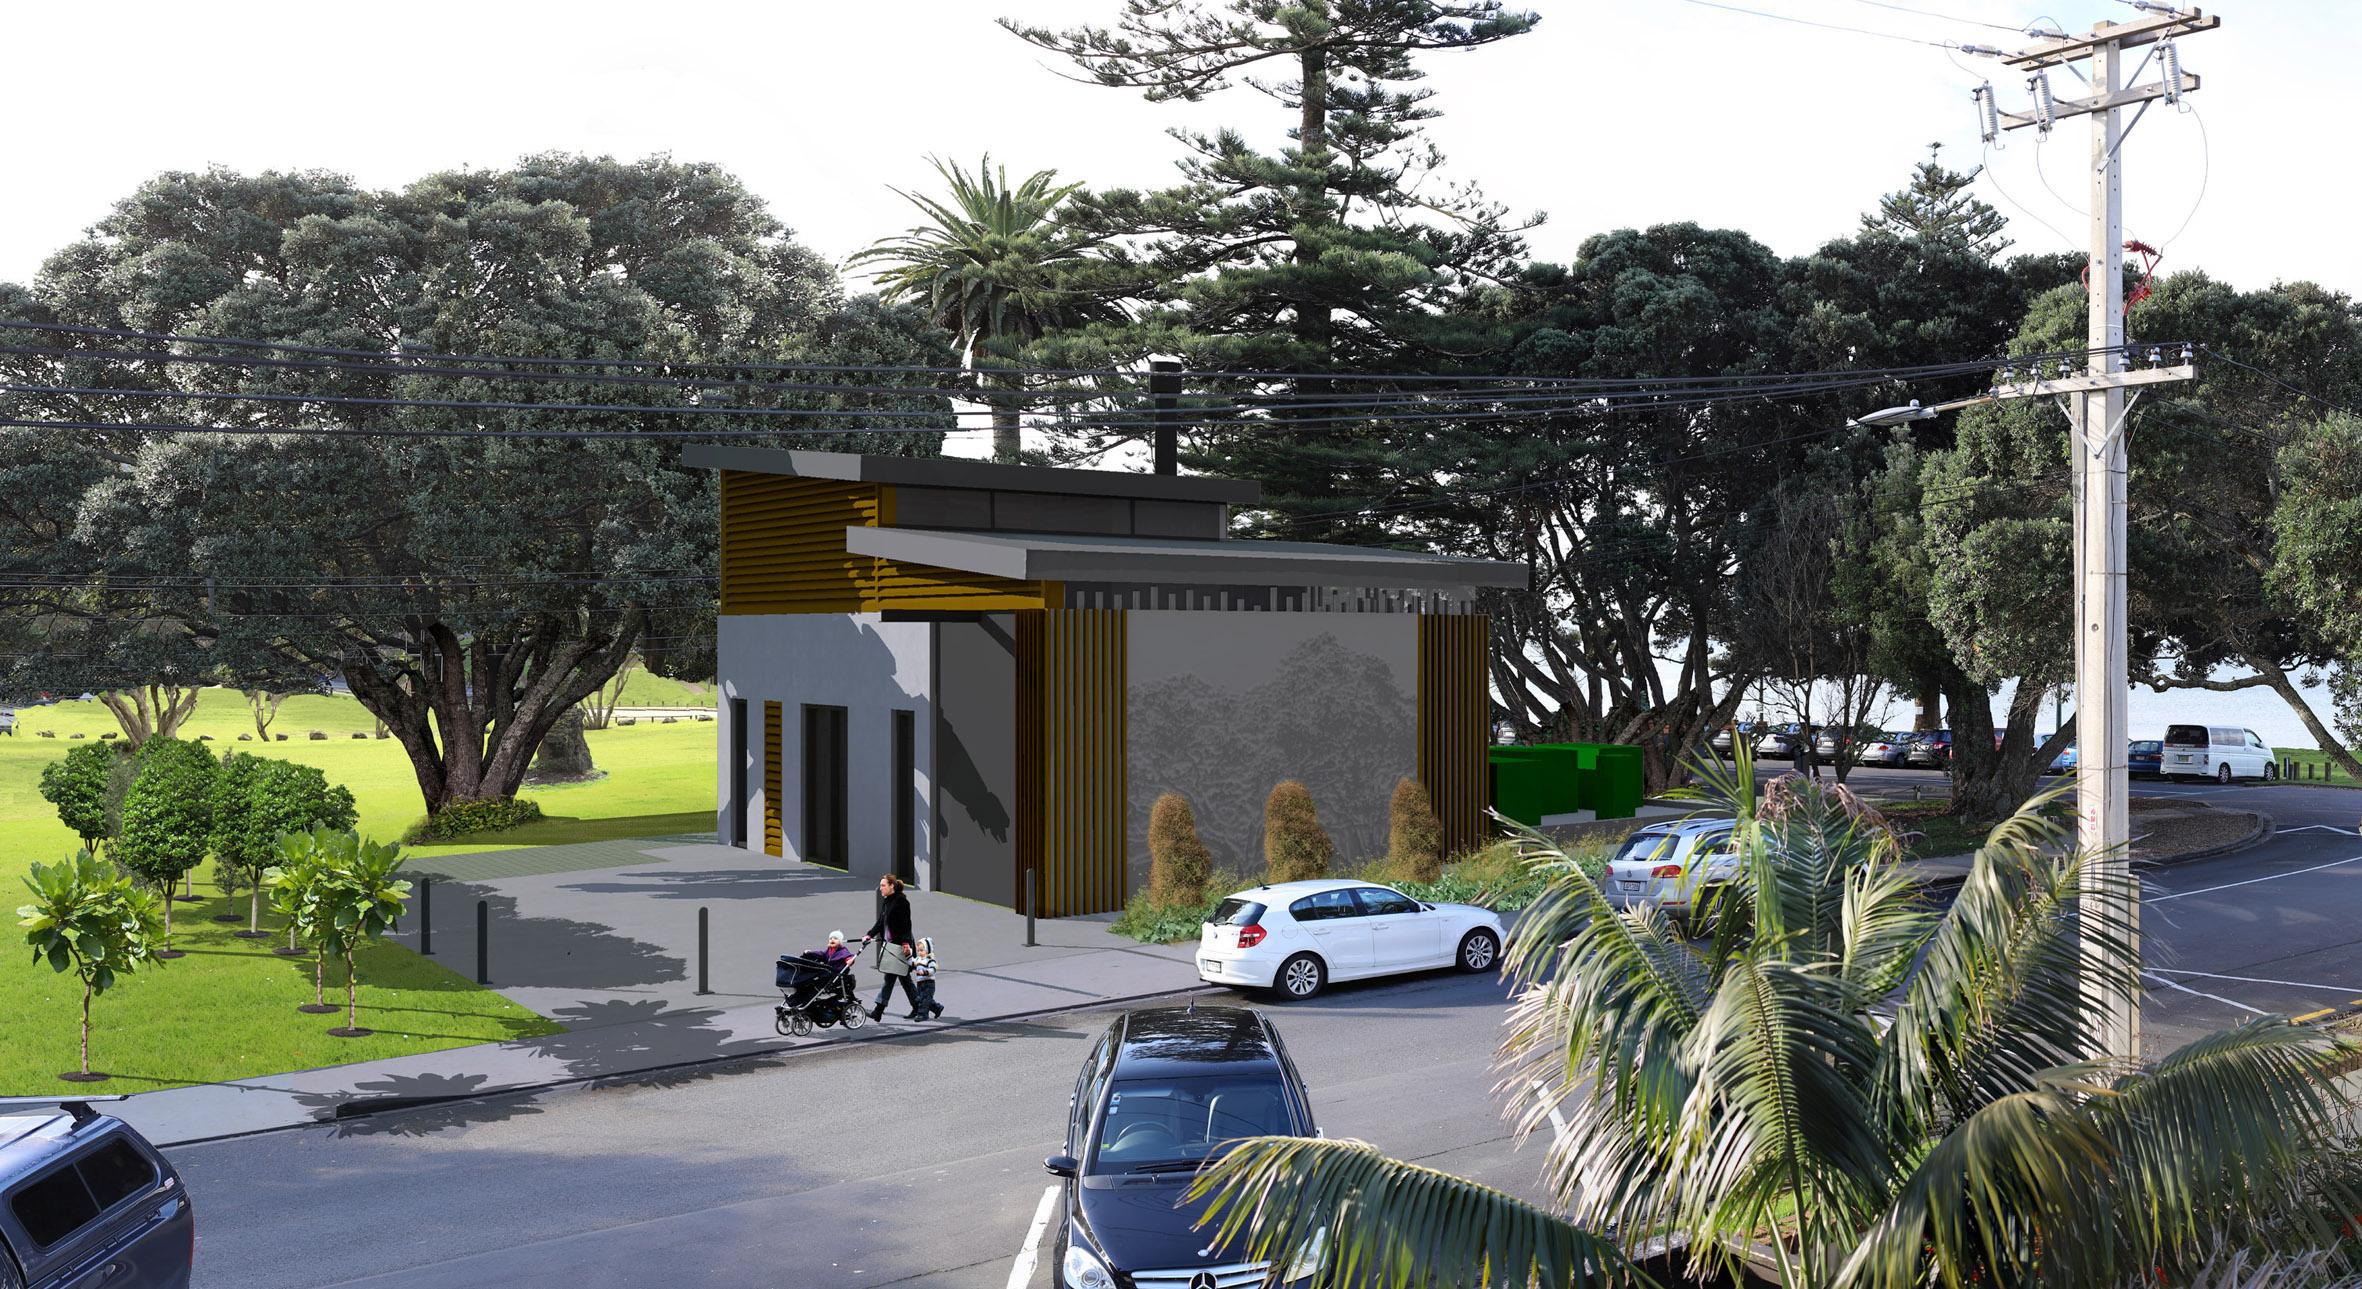 Mairangi Bay wastewater treatment plant concept design image